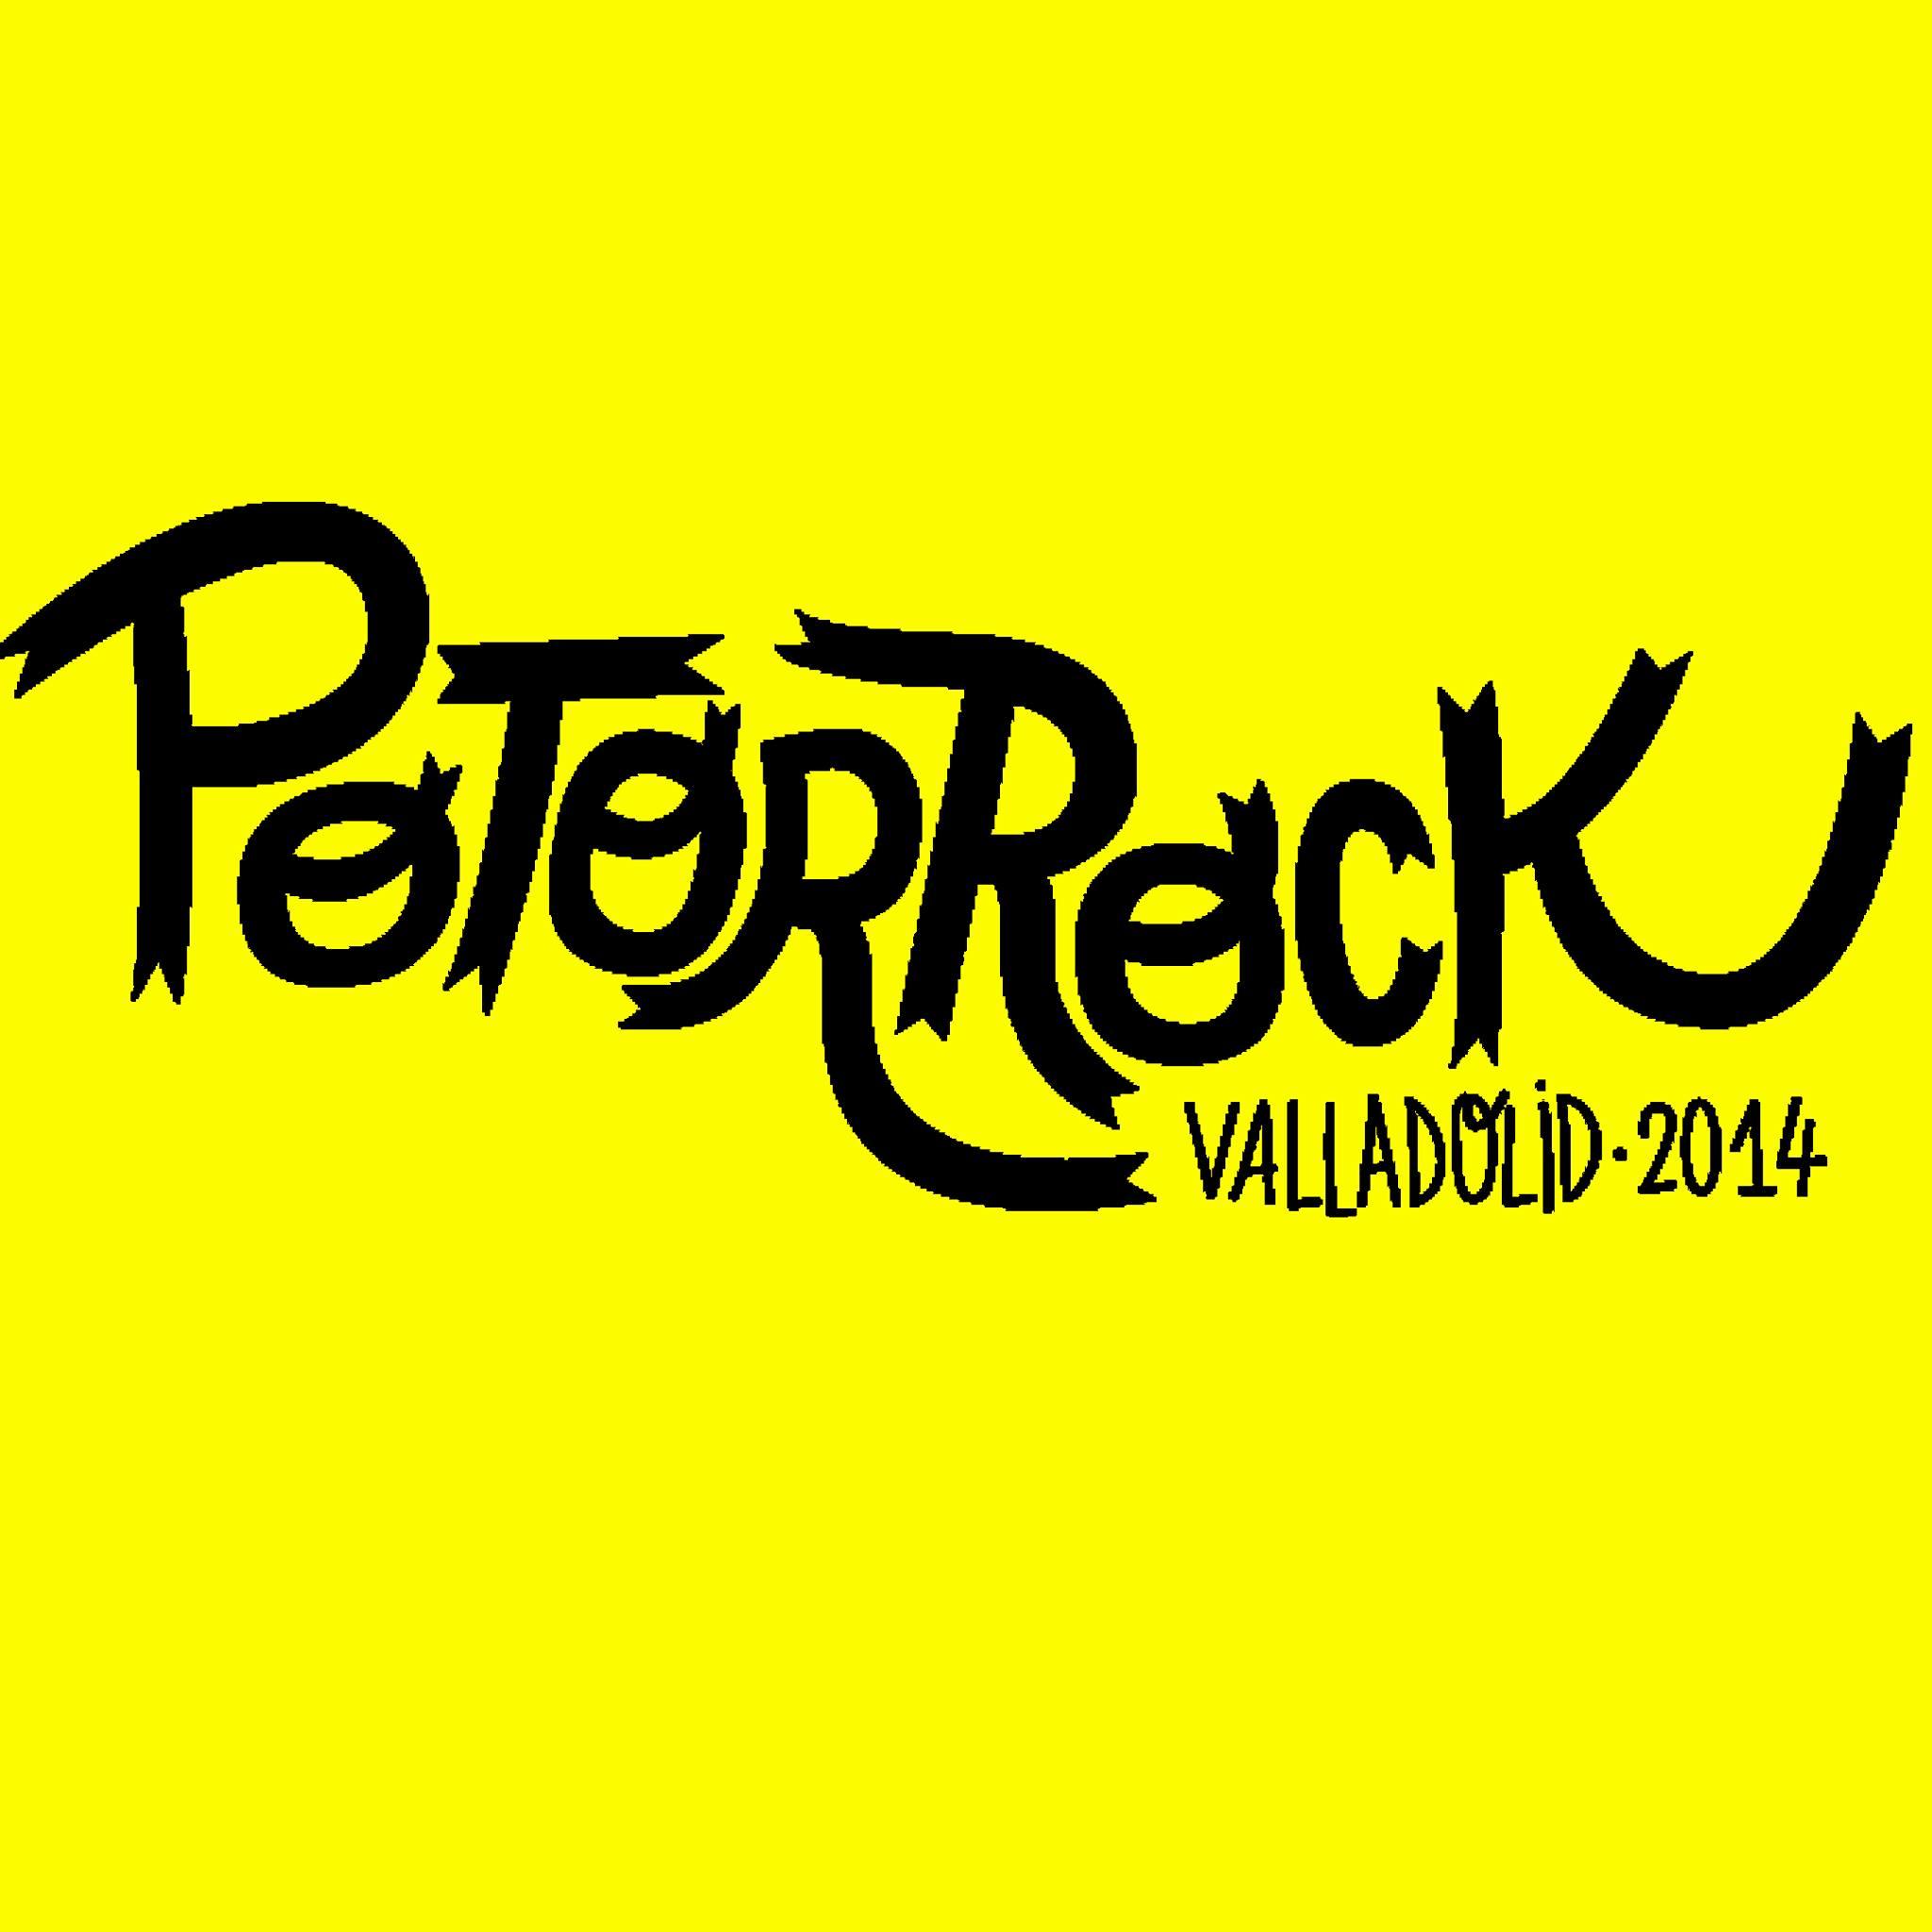 Potorrock